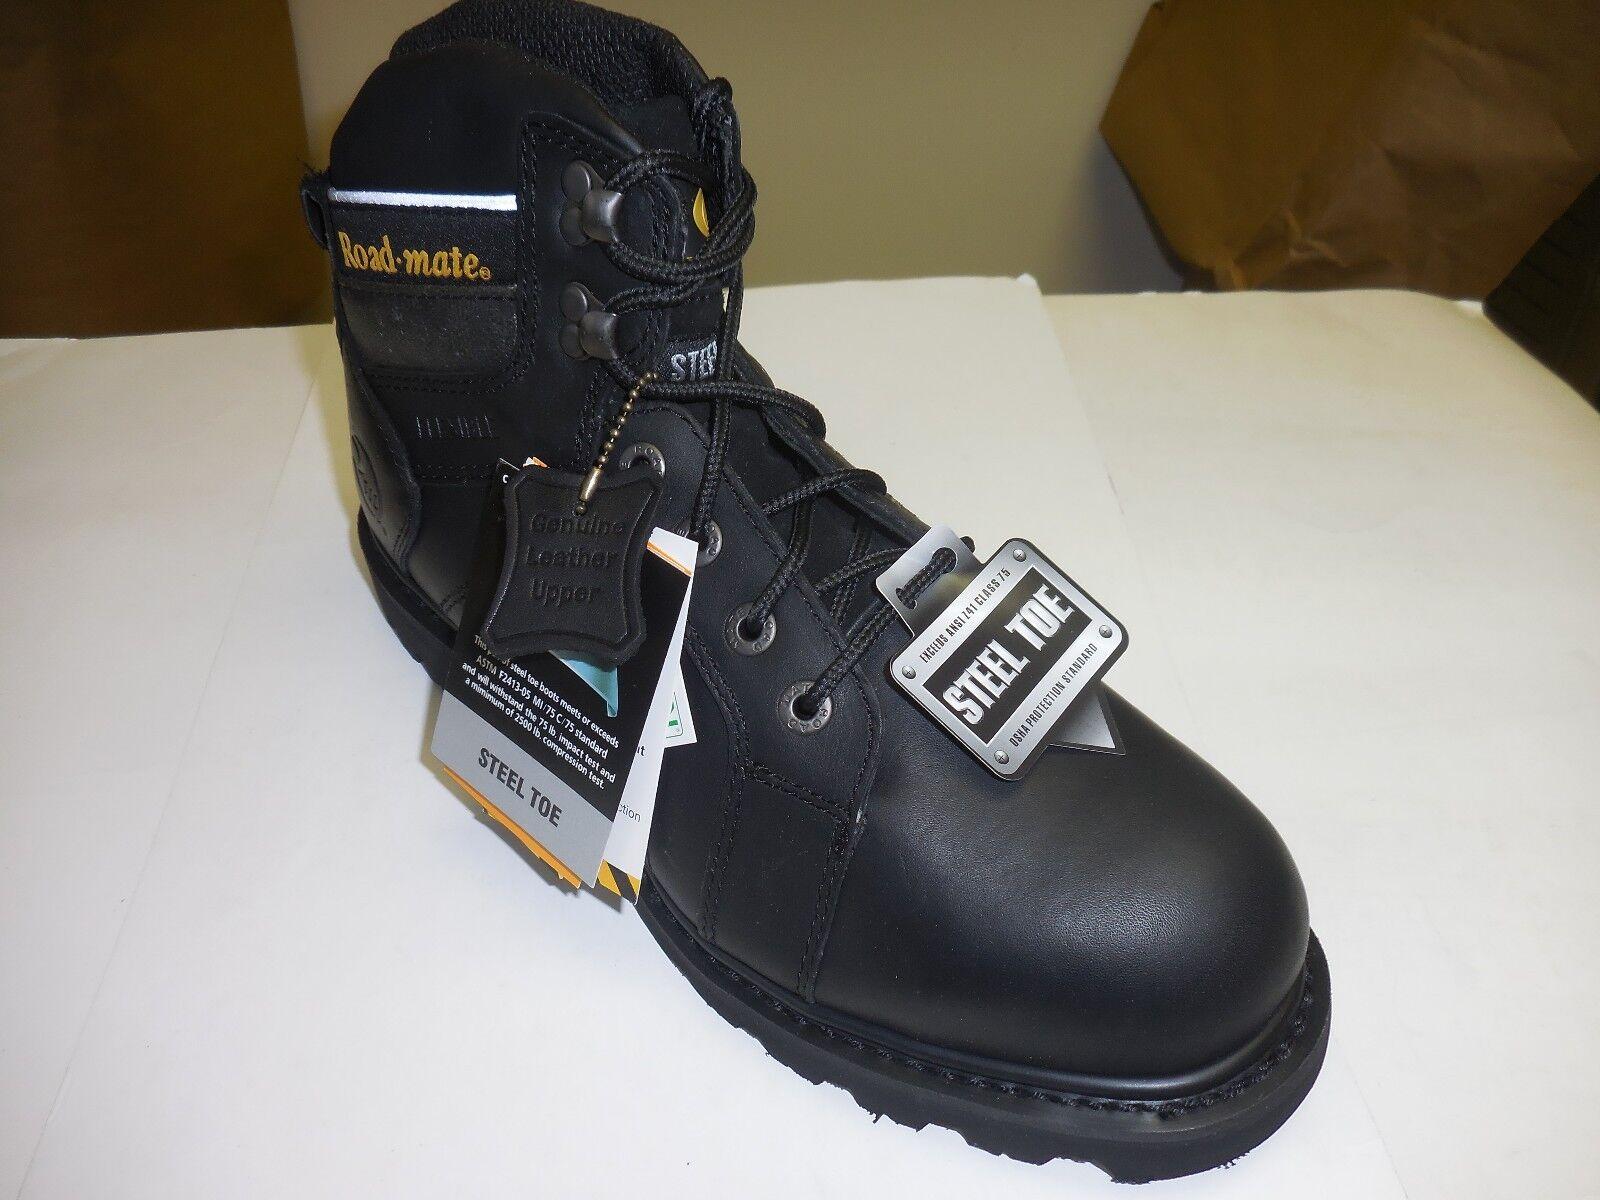 Roadmate Para Hombre 6' negro Oil F g Shock Absobing Flex Steel Toe botas De Trabajo 401s